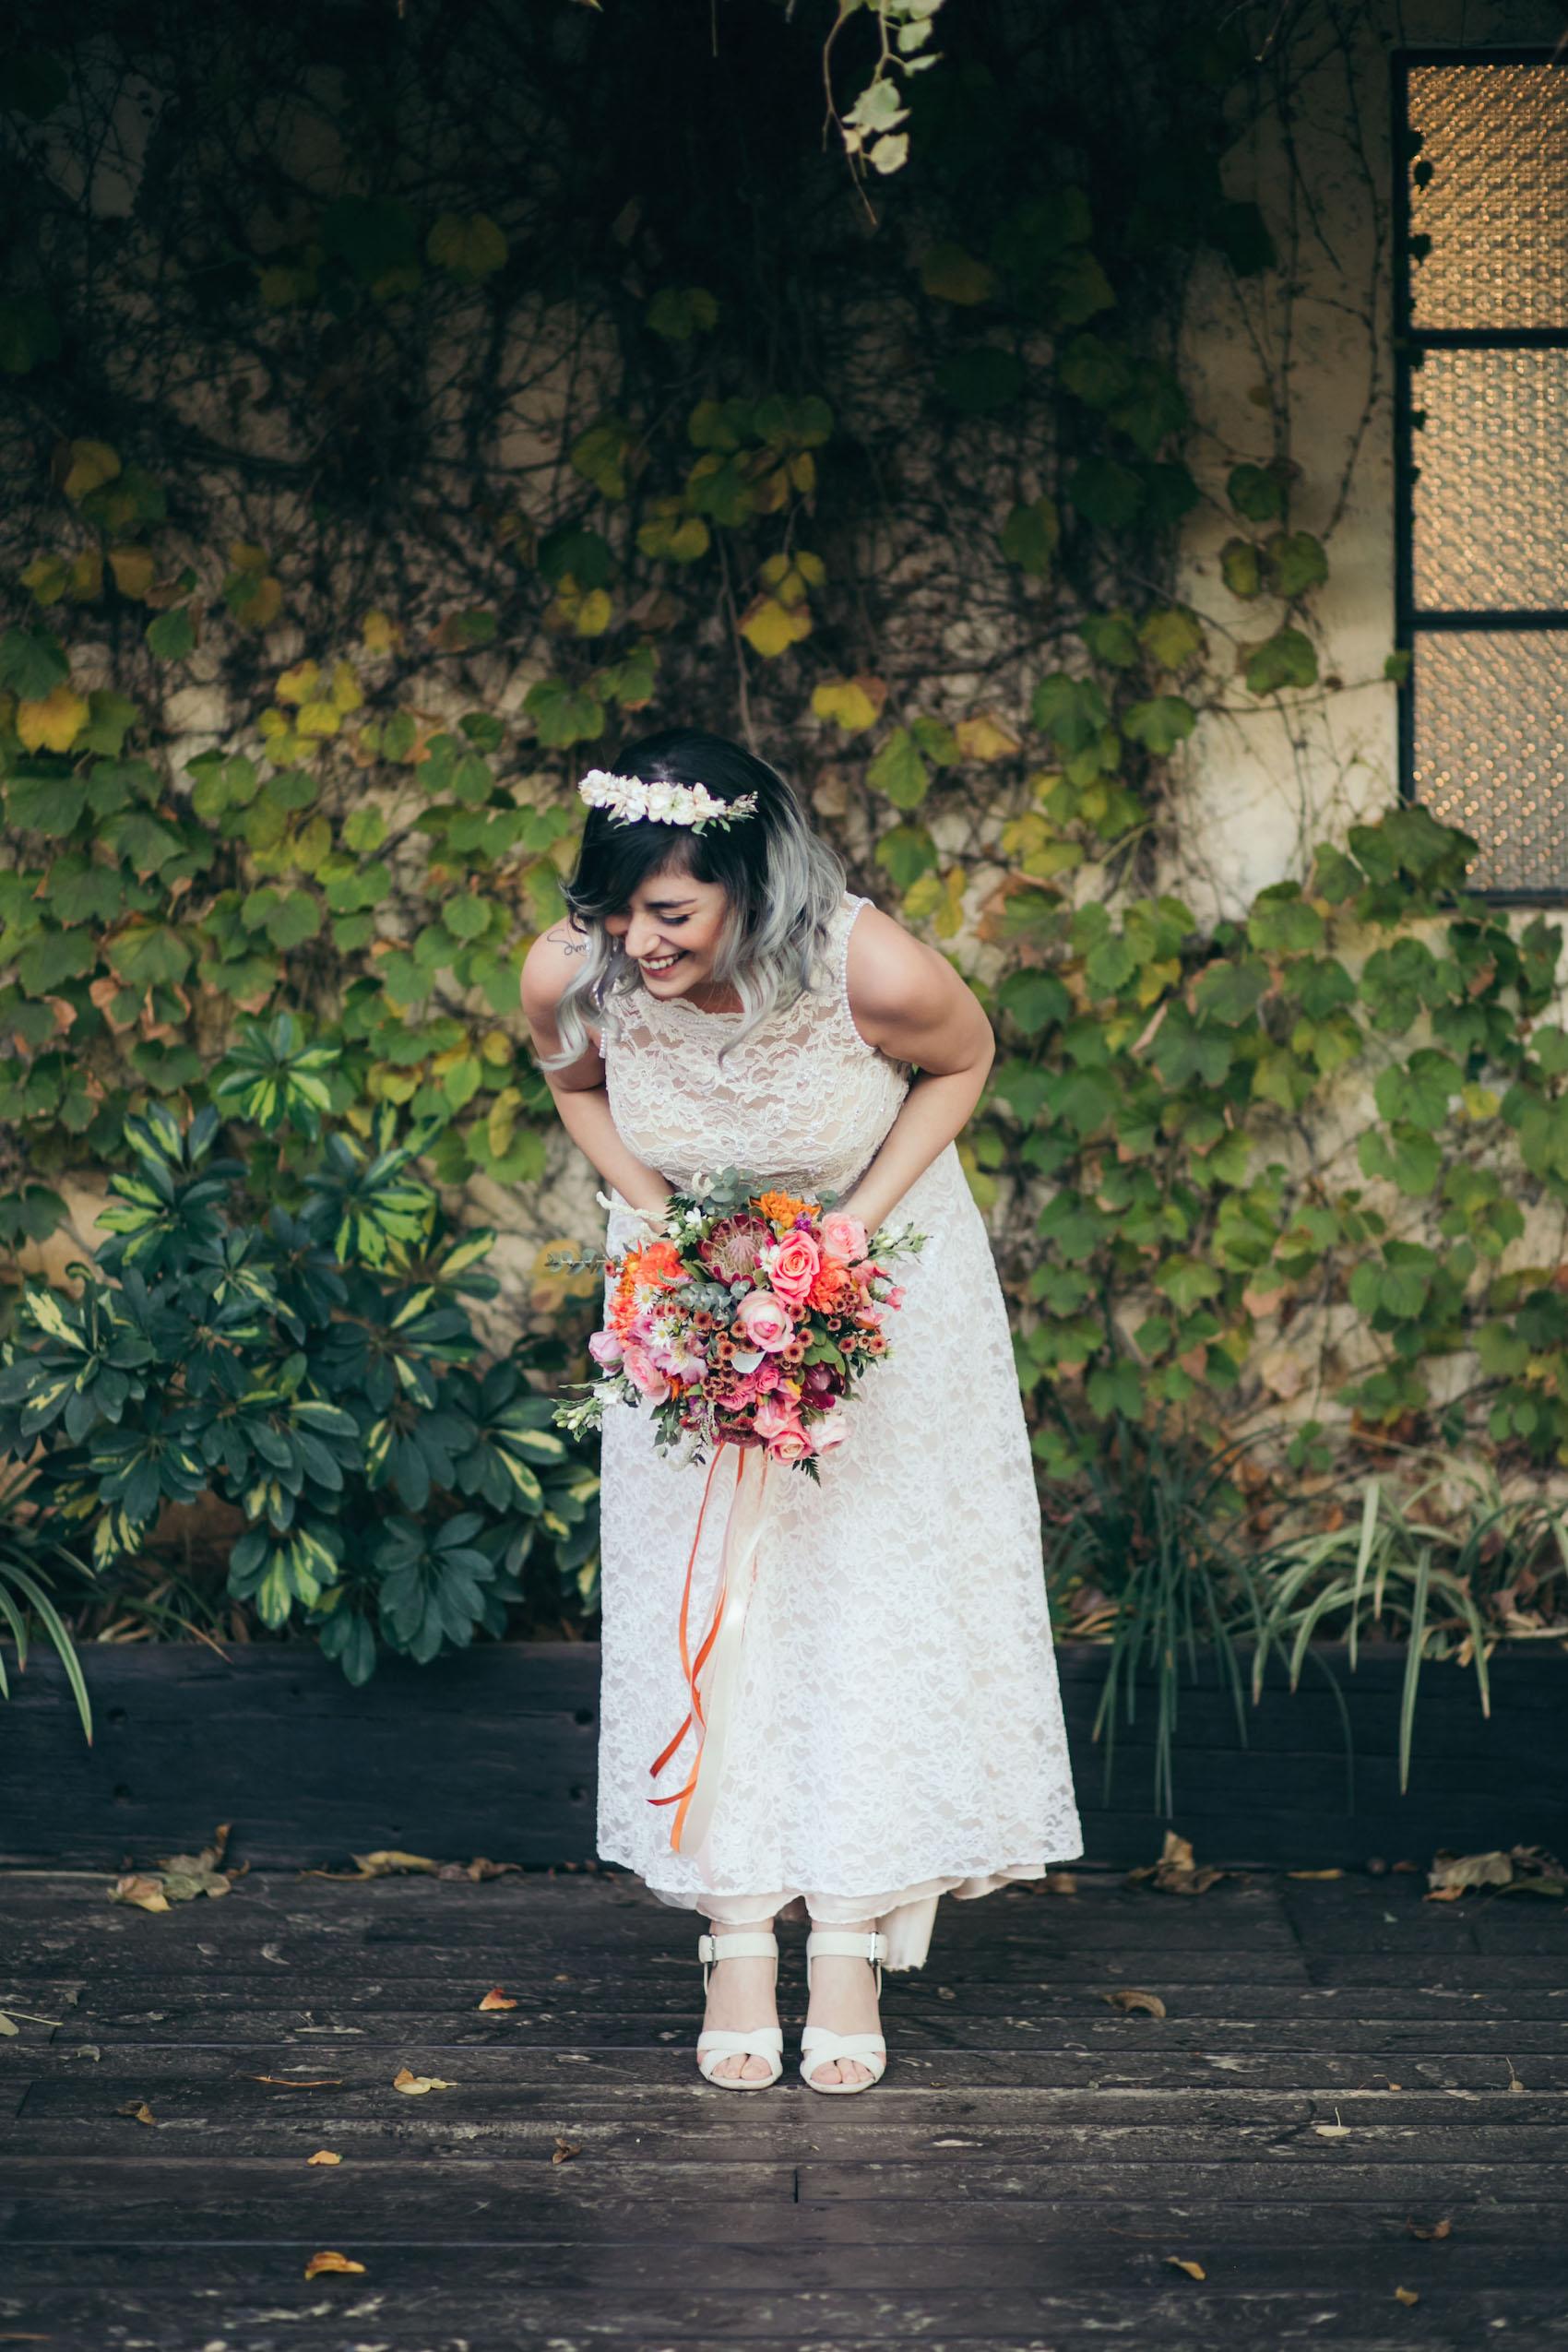 Outdoor in Style: כך תתכננו חתונת גן אלגנטית